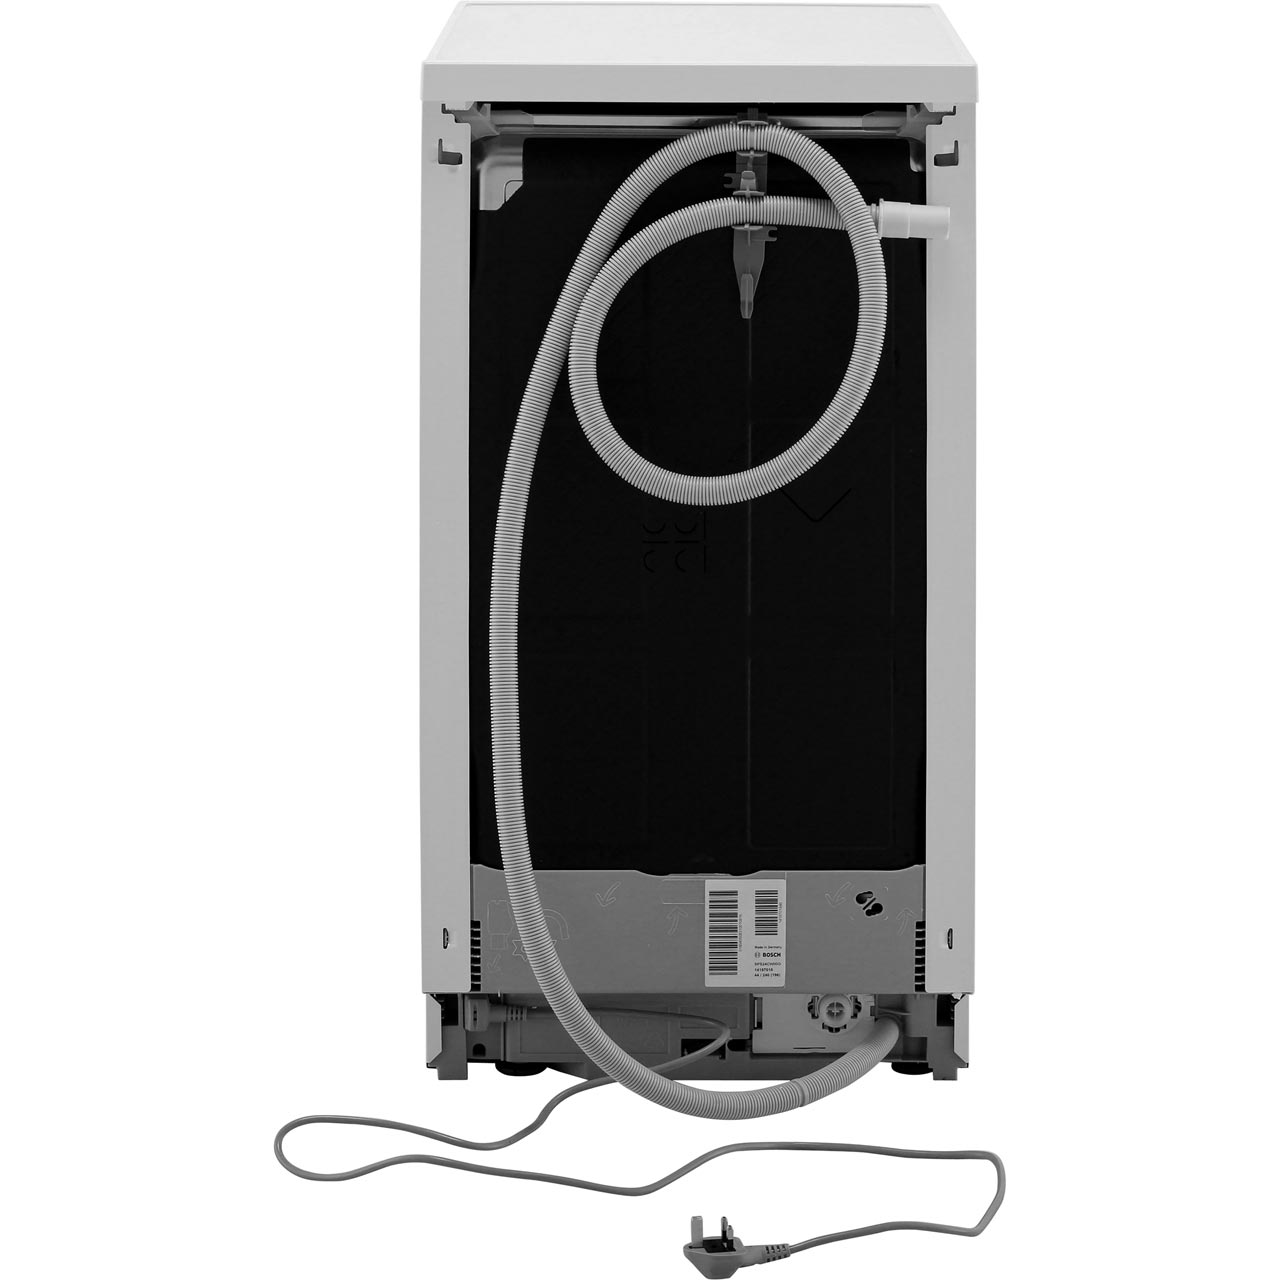 Bosch Serie 2 Sps24cw00g Slimline Dishwasher White